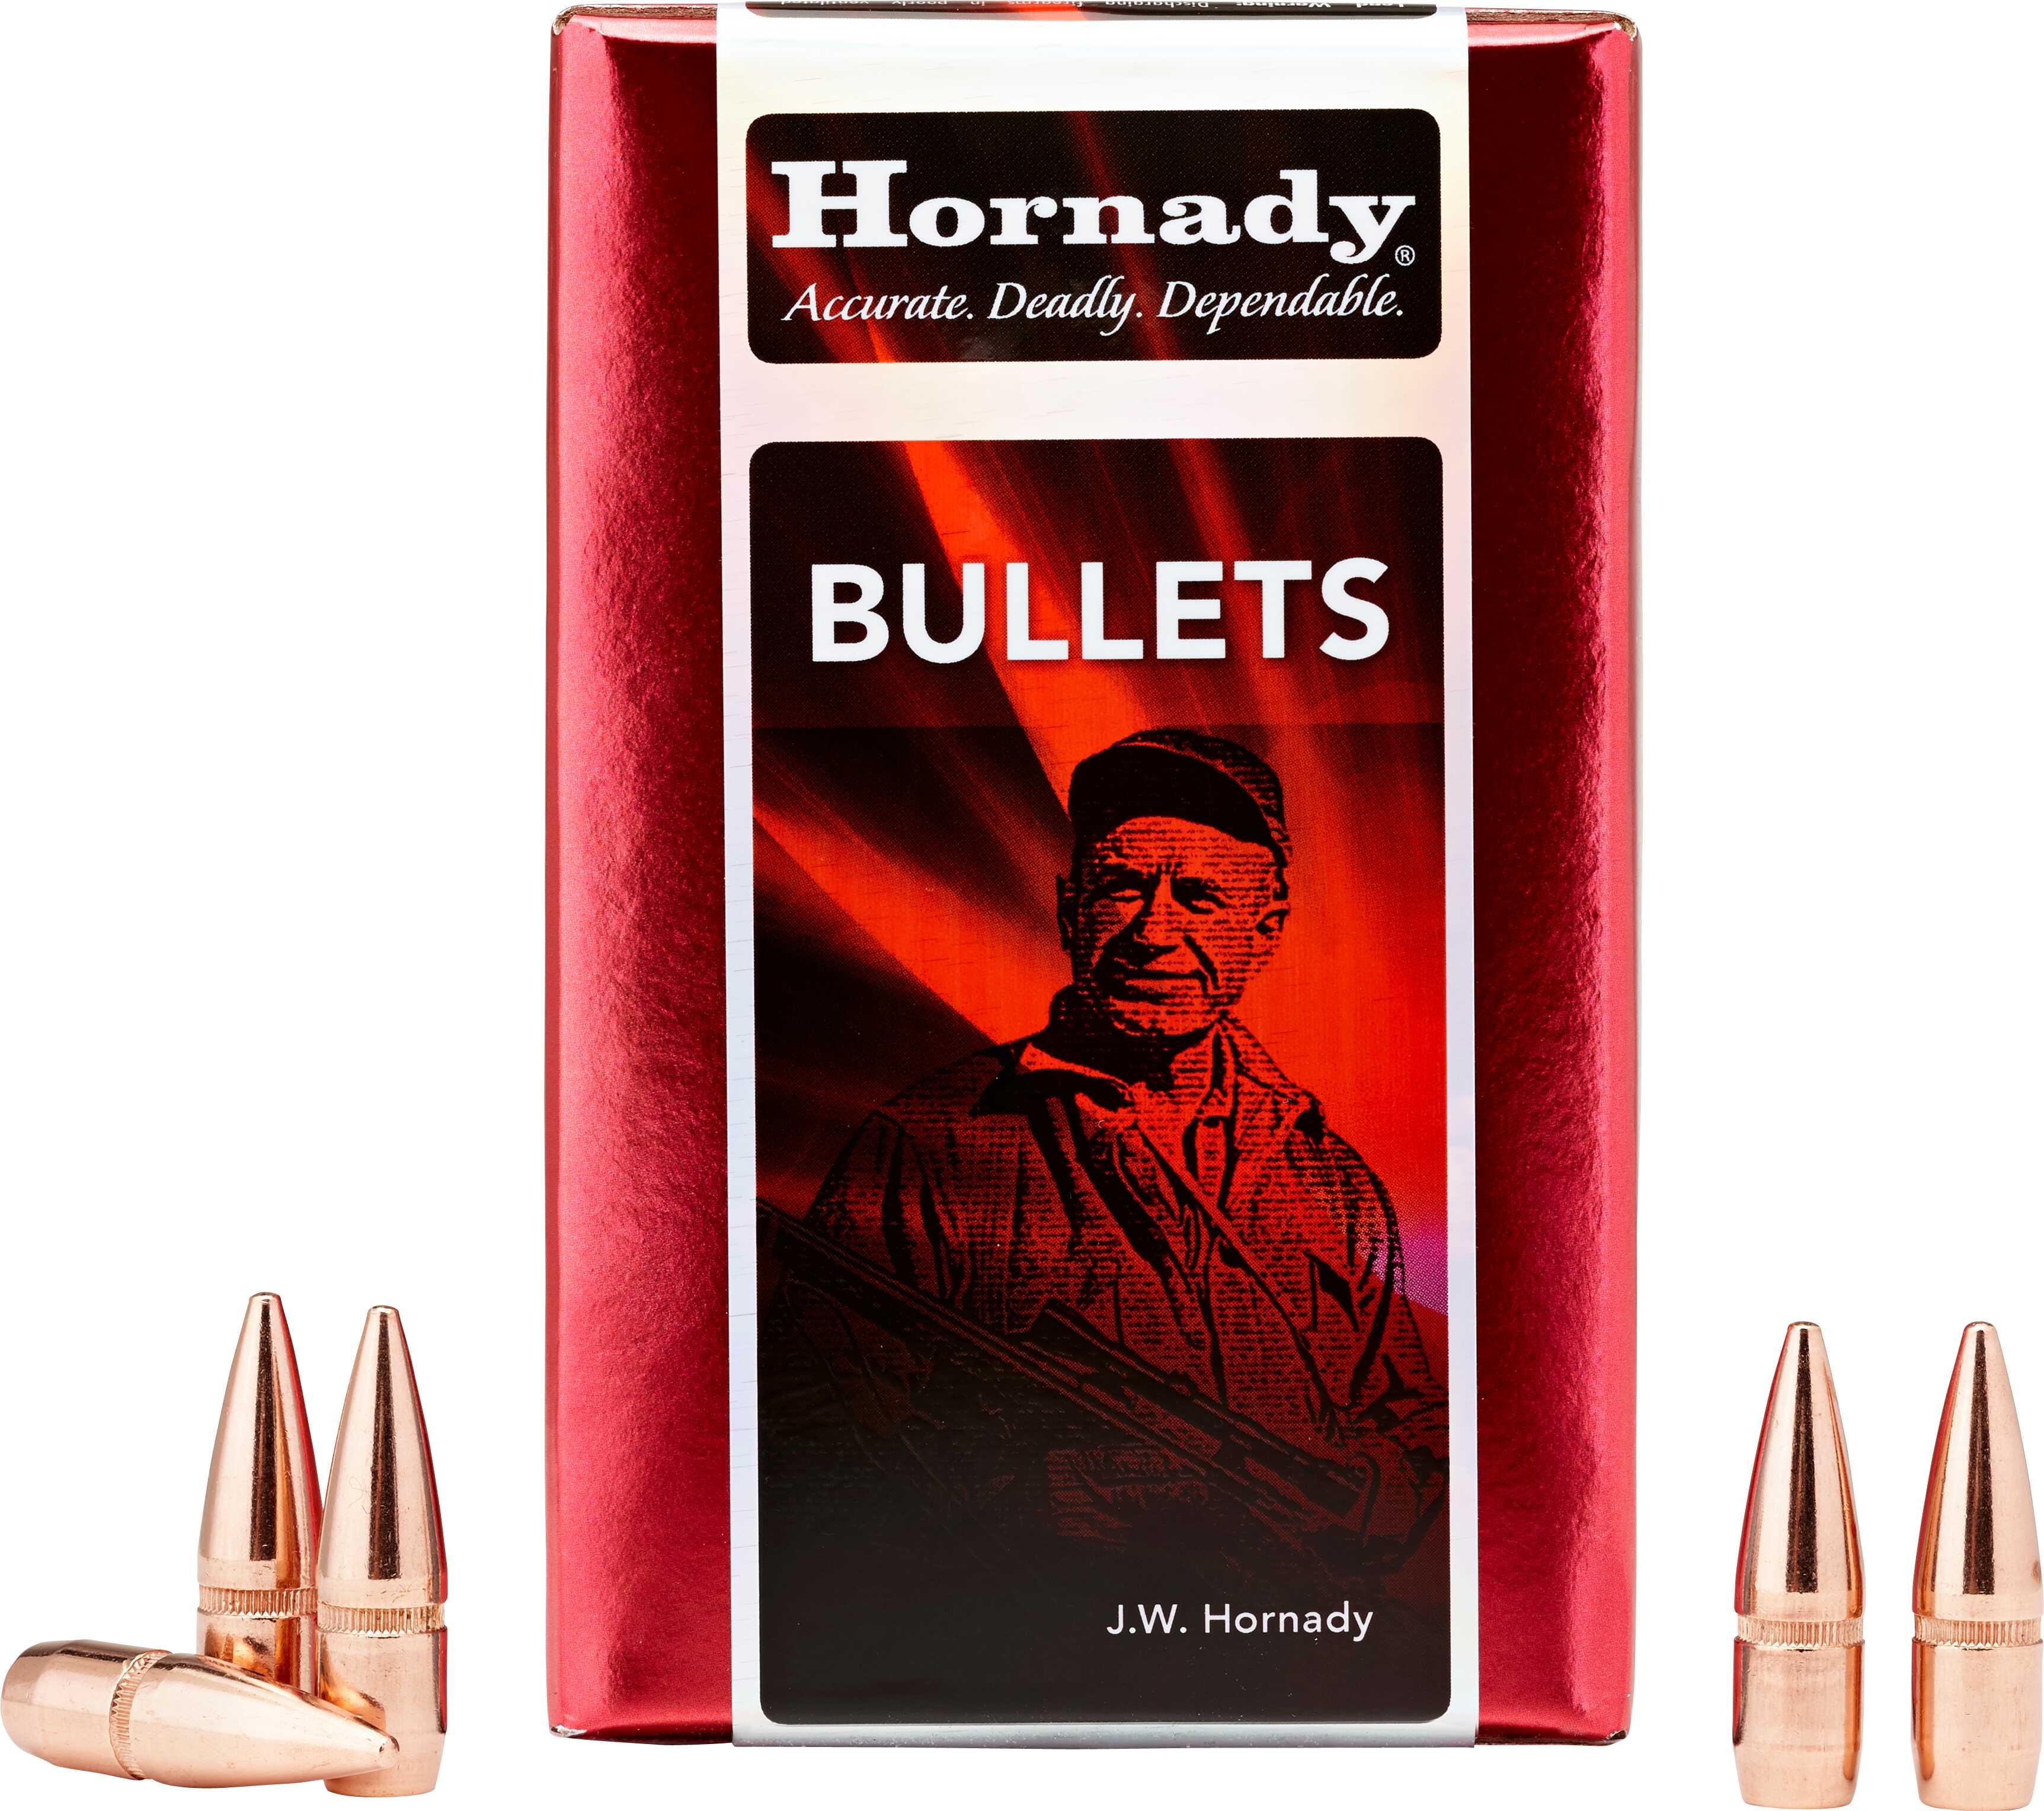 Hornady Rifle Bullet 35 Caliber 200 Grain Round Nose 100/Box Md: 3515